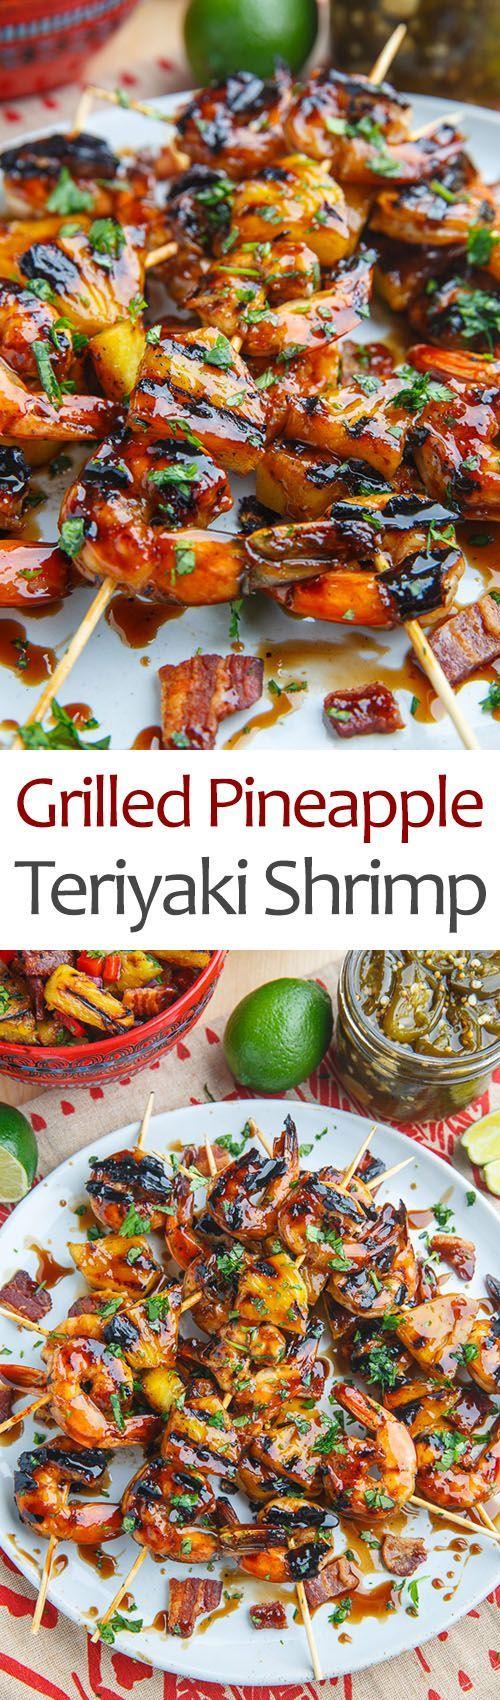 Teriyaki Grilled Shrimp and Pineapple                                                                                                                                                                                 More